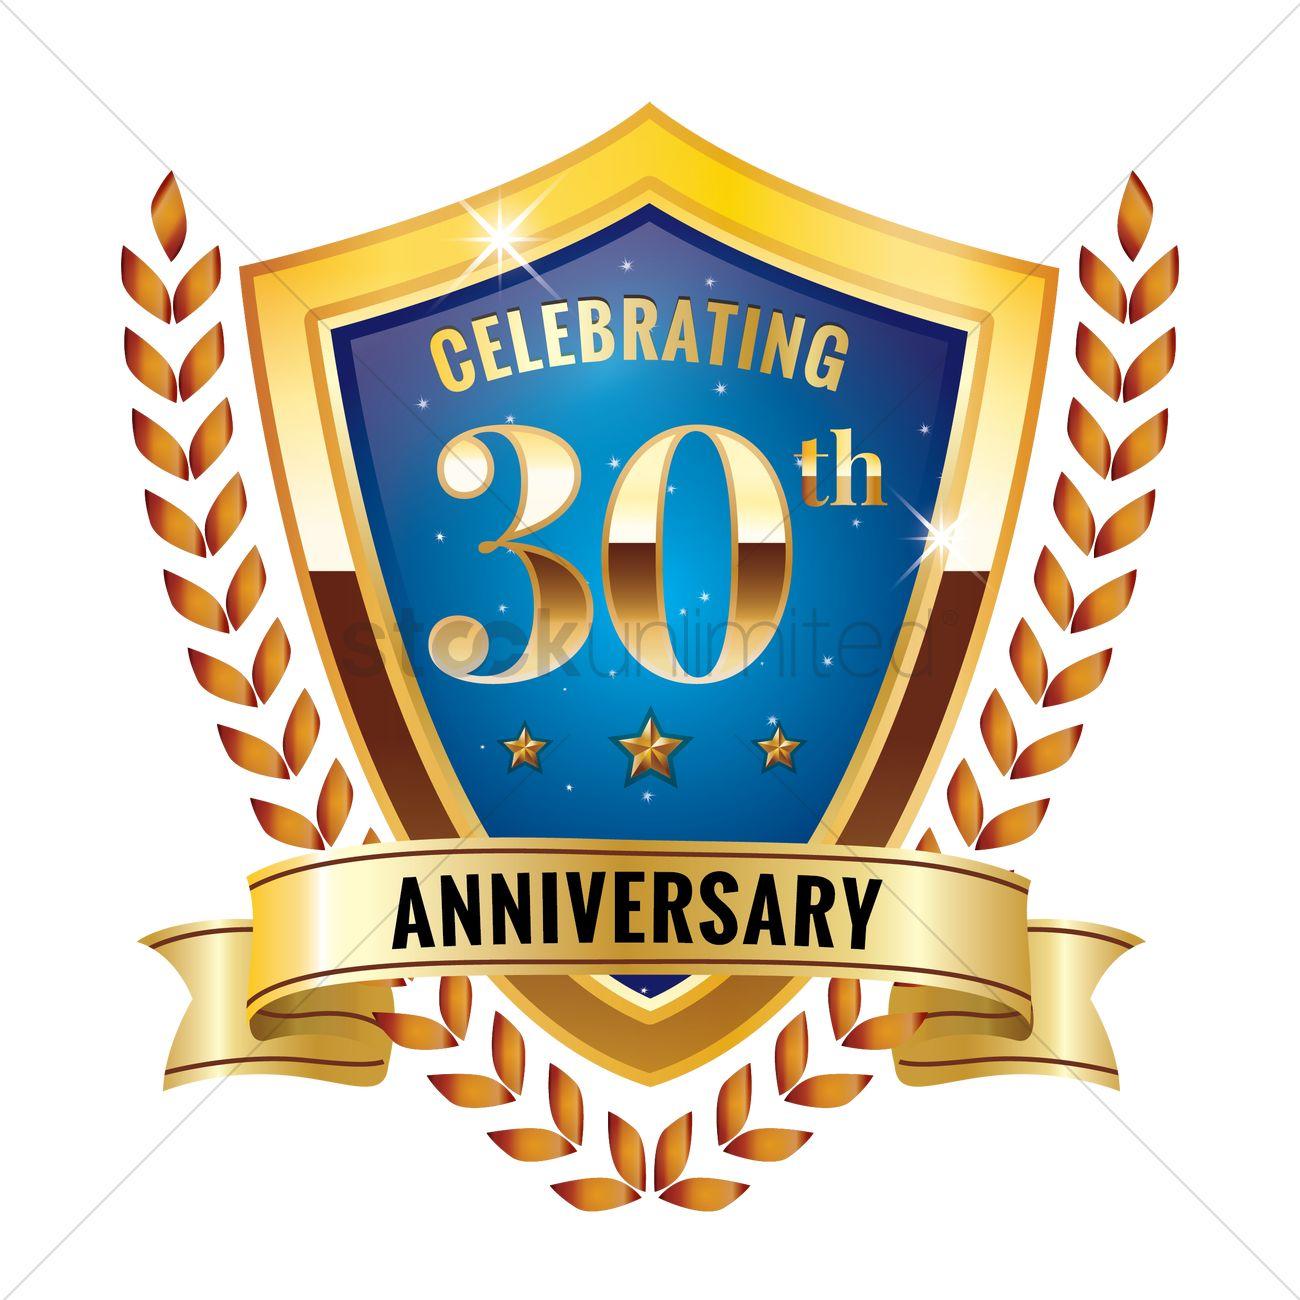 Thirty Years Anniversary Design Vector Image 1825262 Stockunlimited